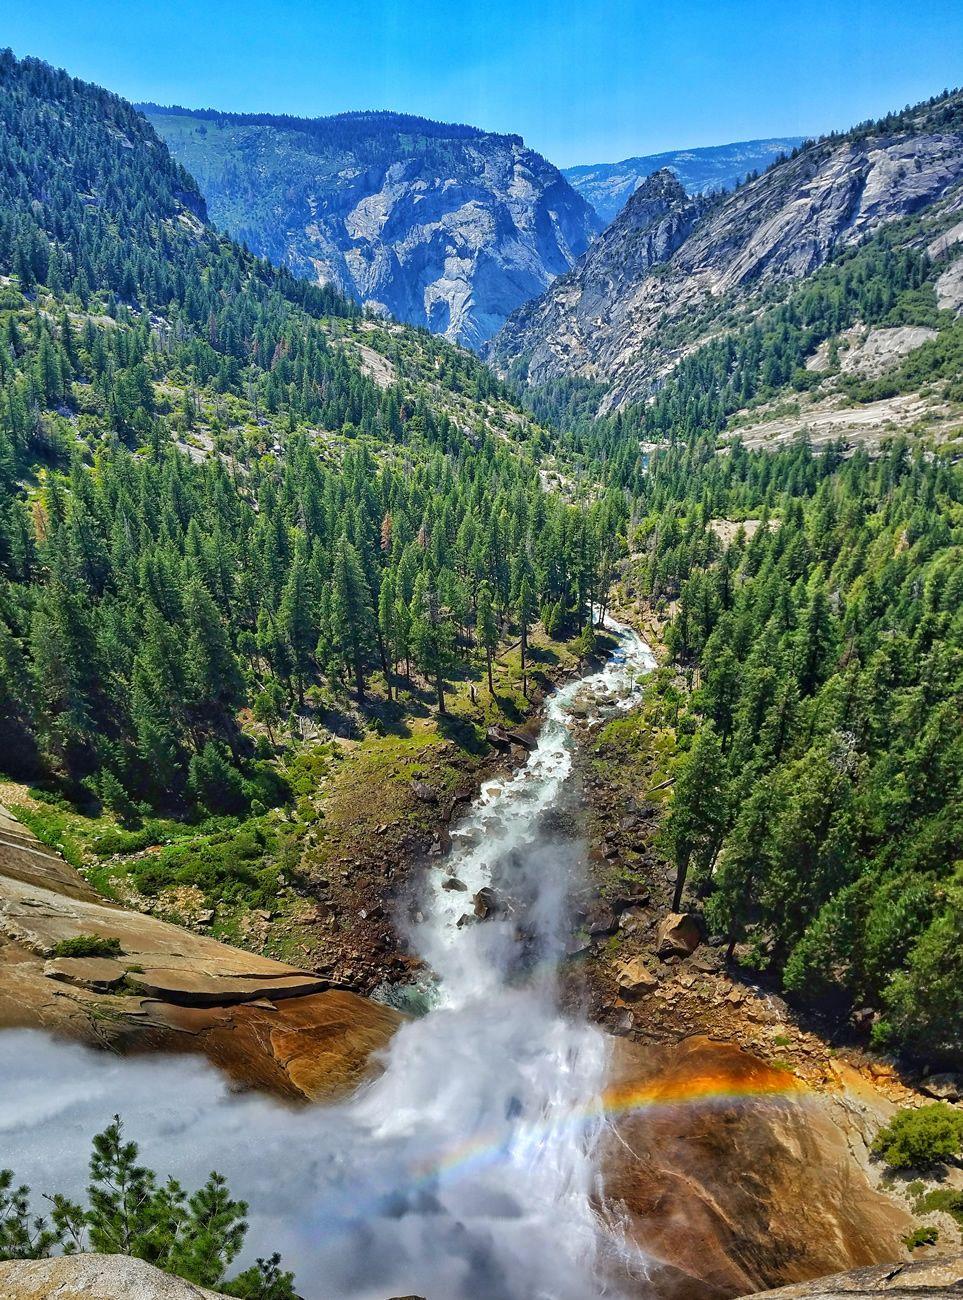 Mist Trail Yosemite National Park California EUA